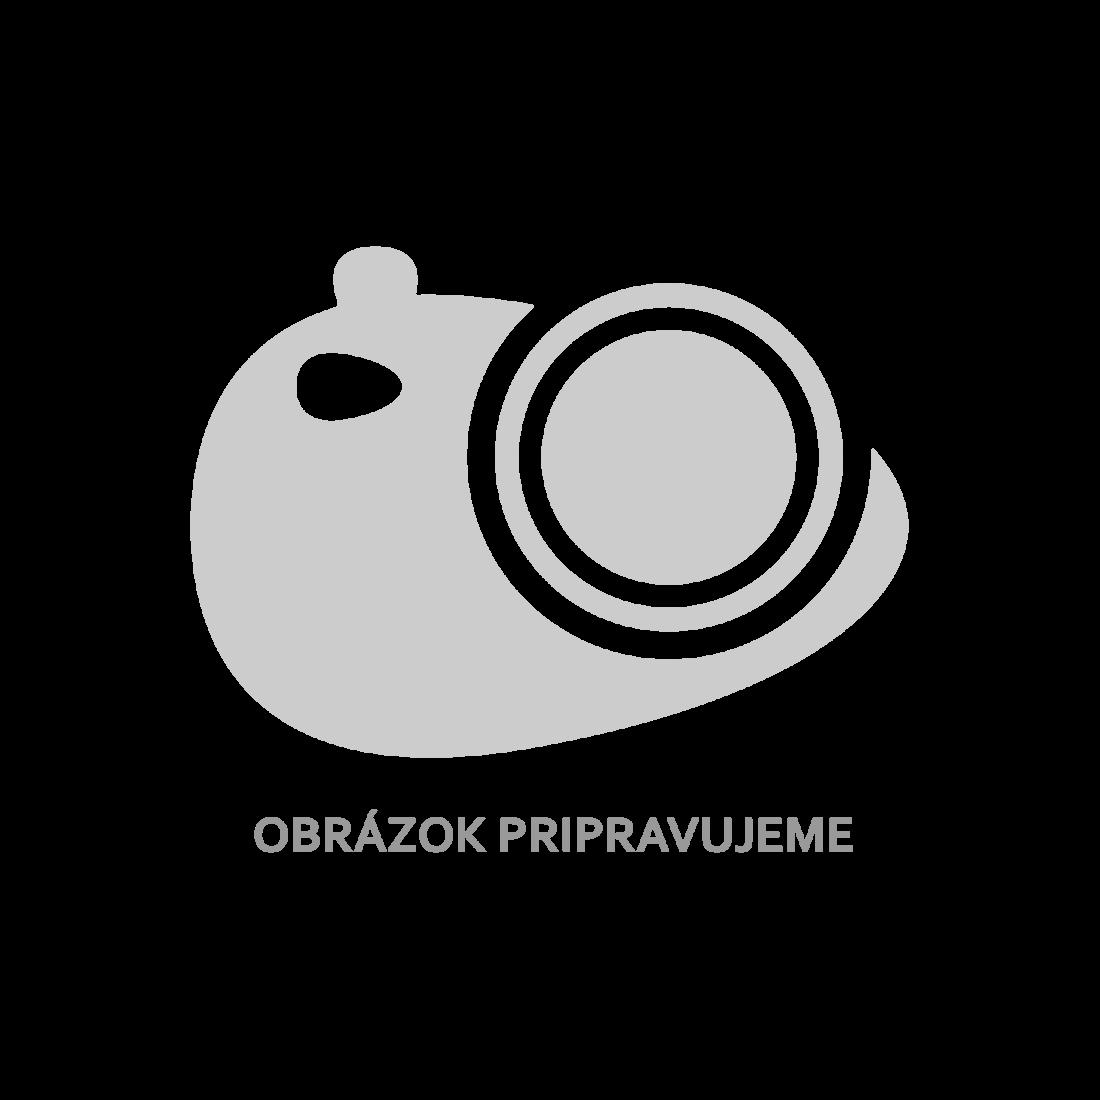 WPC dlaždice 30x30cm 11 ks 1 m2, hnedé